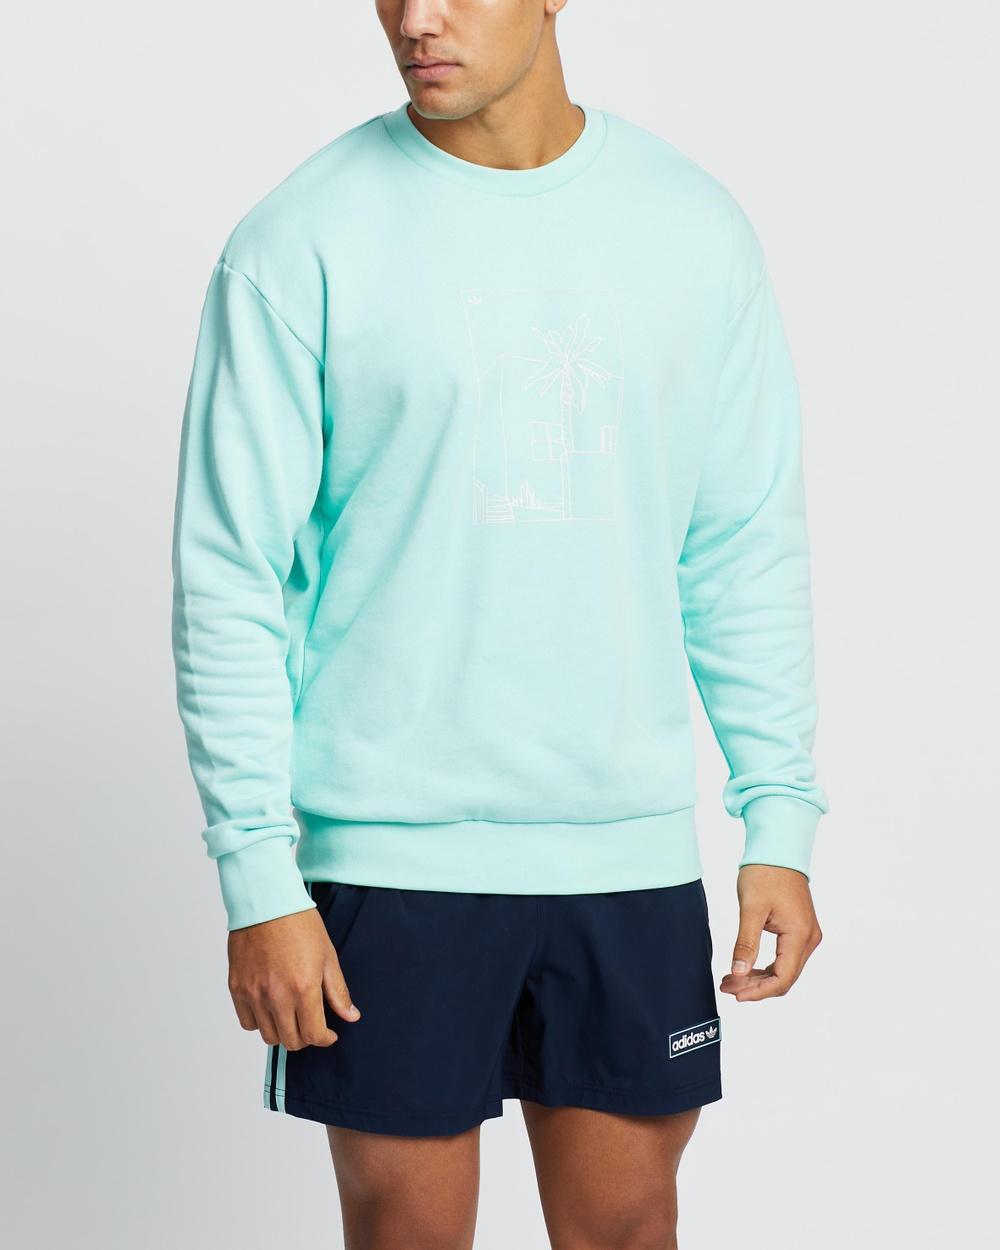 adidas Originals Linear Logo Crewneck Crew Necks Icy Mint